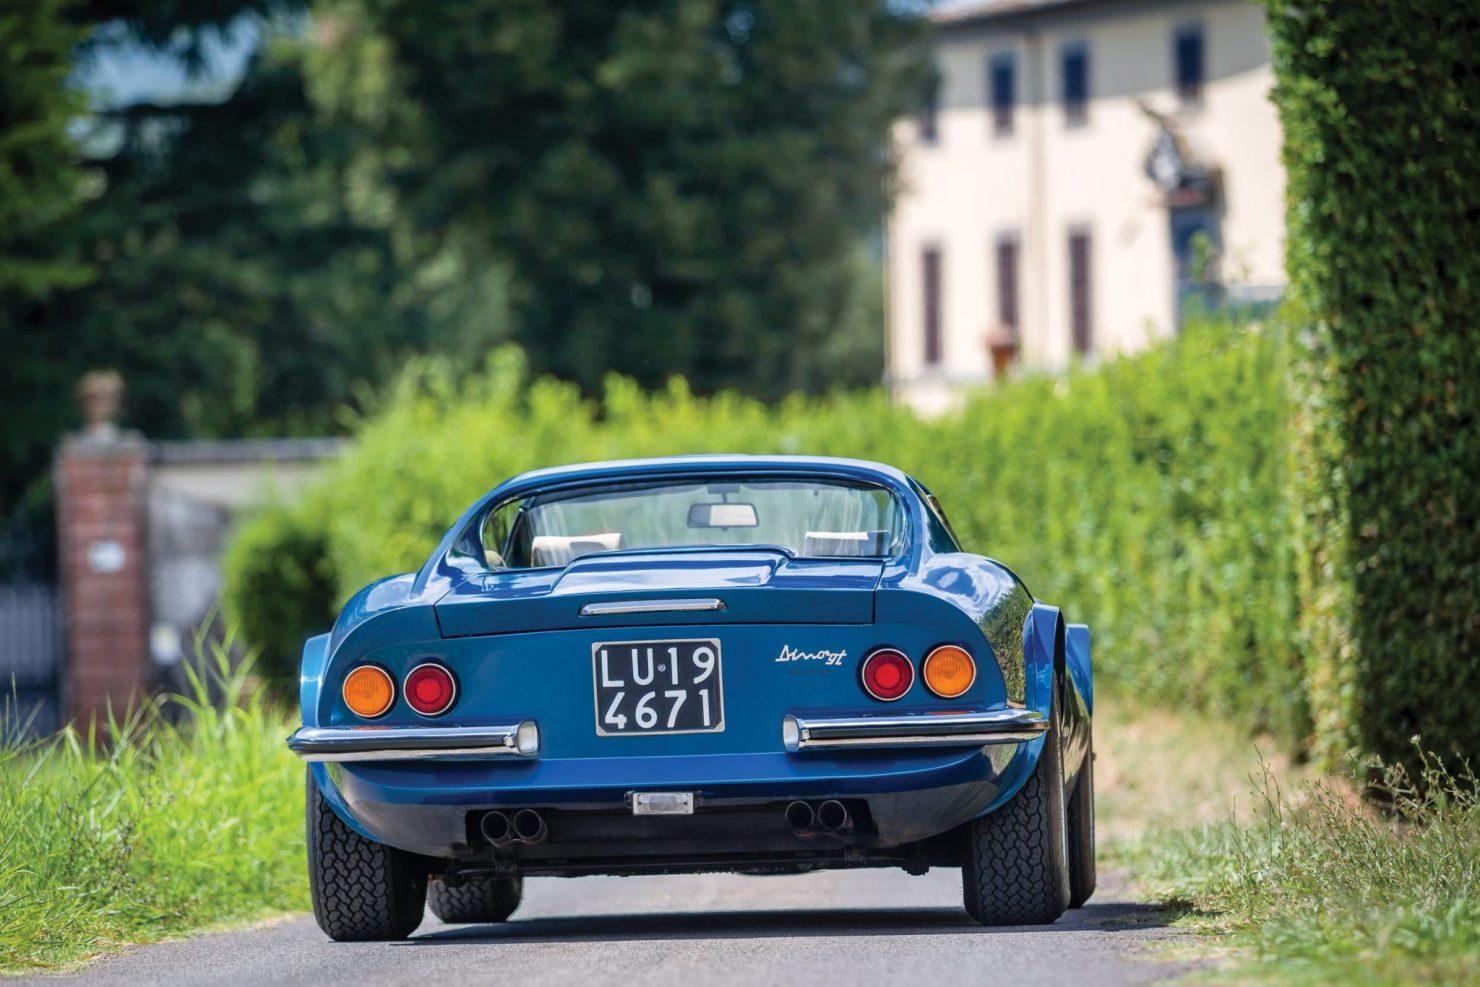 ferrari dino 246 gts car 20 1480x987 - 1973 Ferrari Dino 246 GTS